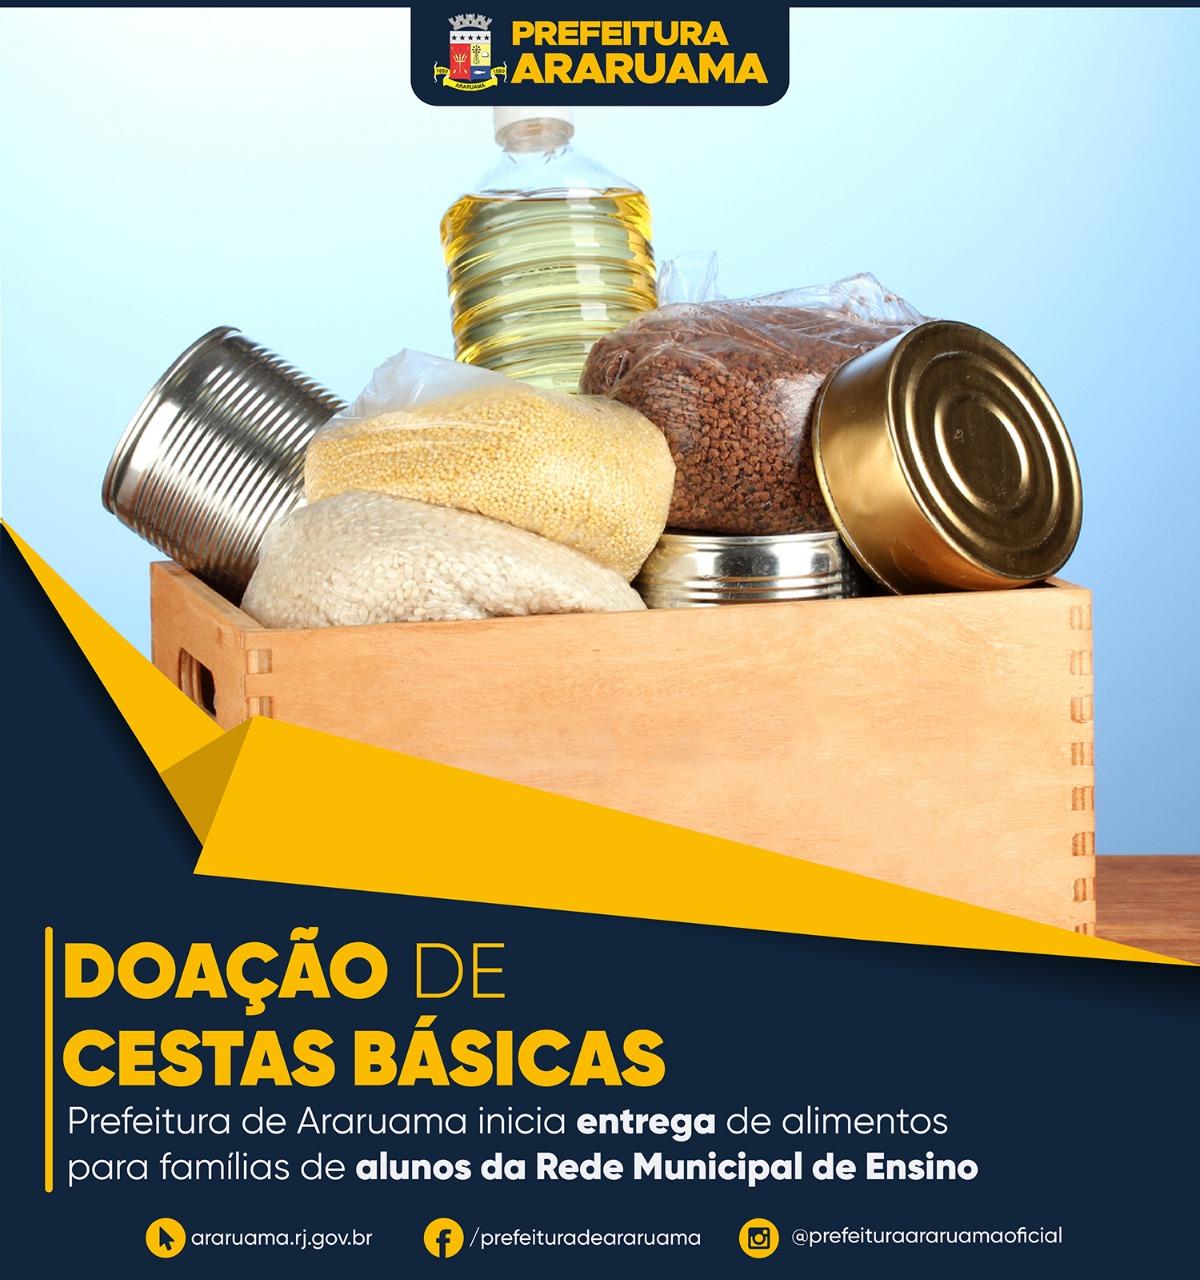 Prefeitura de Araruama continua na terça-feira (14) a entrega de cestas básicas para famílias de alunos da rede municipal